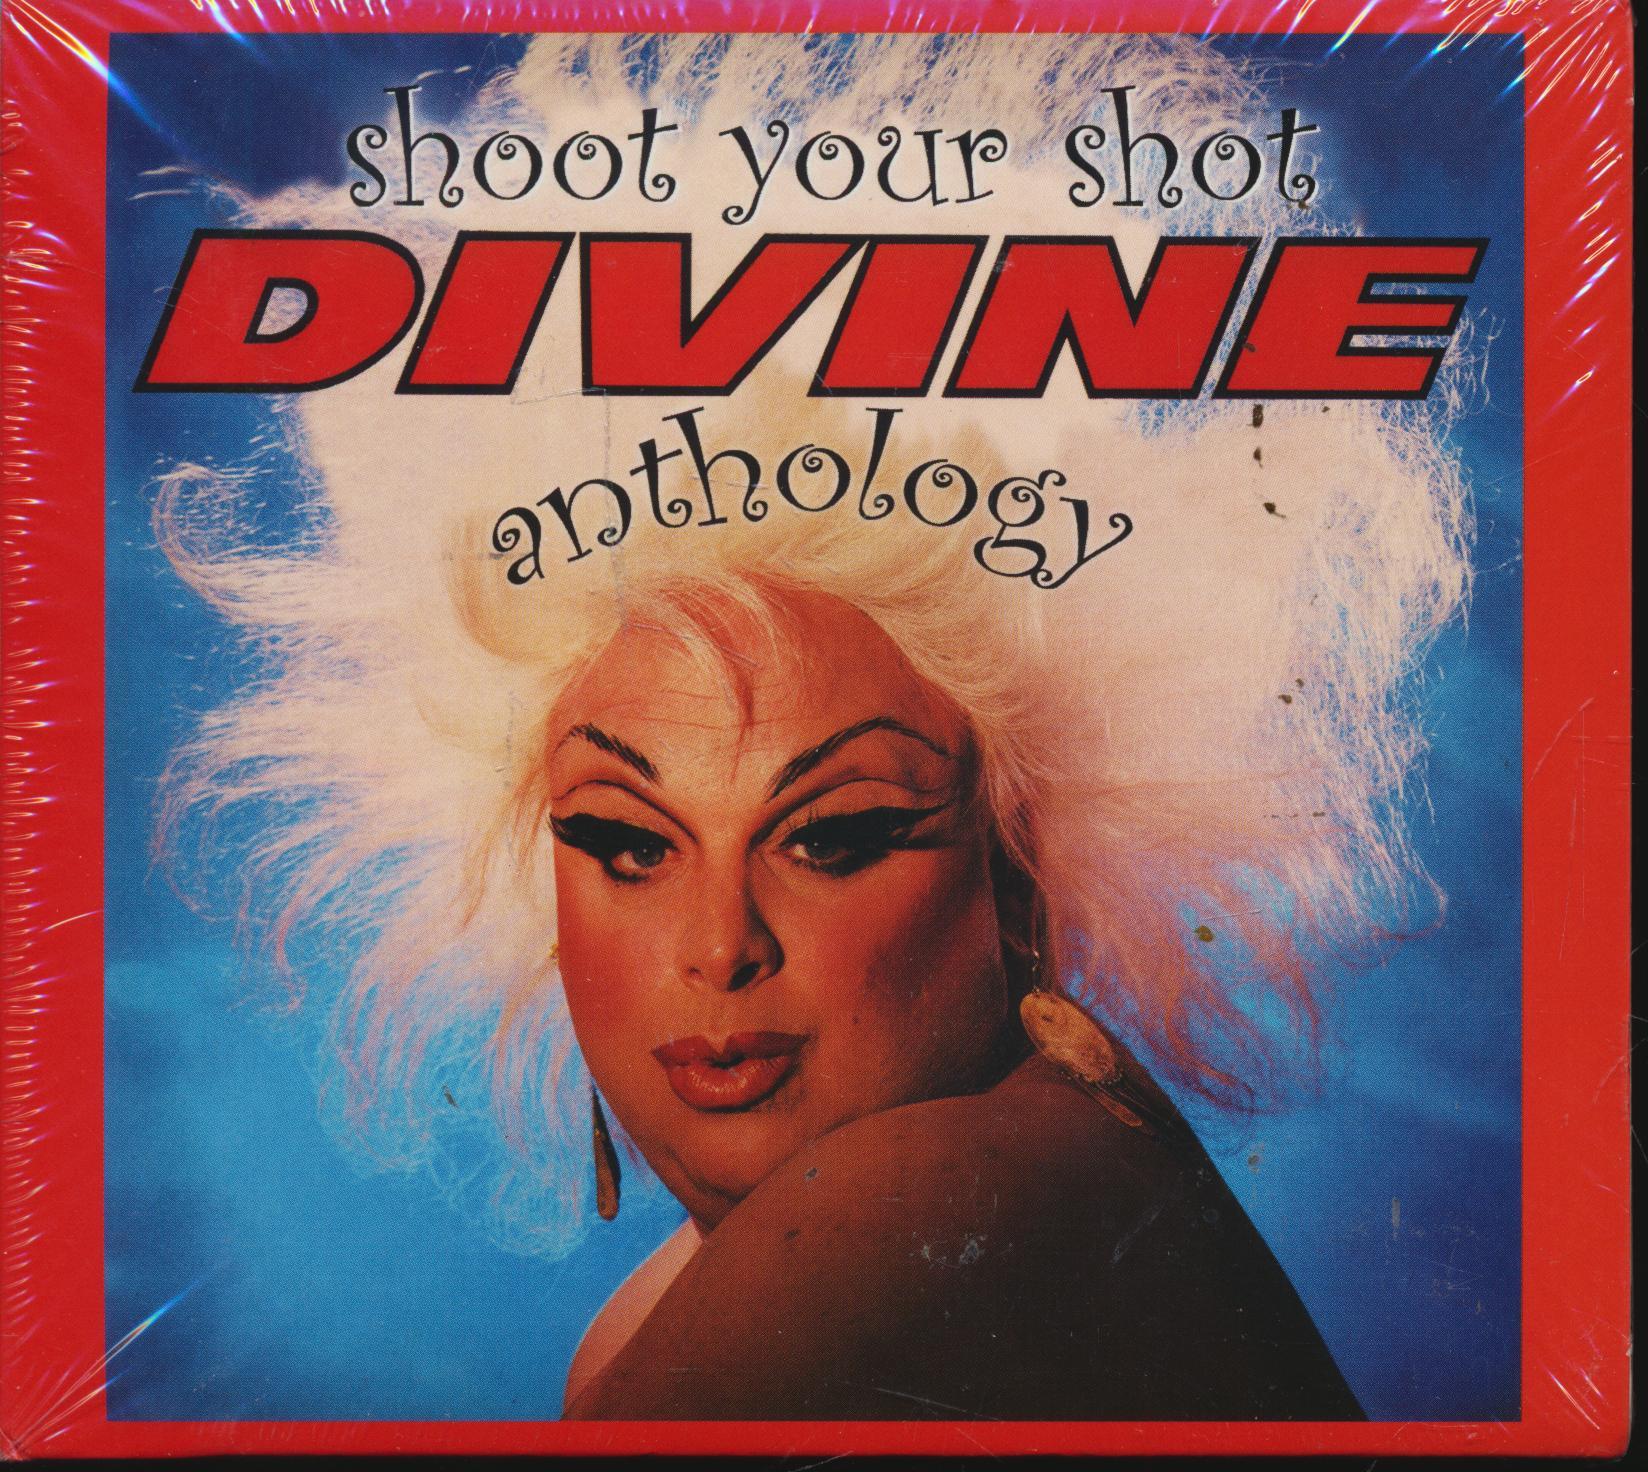 Cd Divine - Shoot Your Shot  The.. ☆ SUPERSHOP ☆ tvoj obchod ☆ cd ... 1a86aff6405